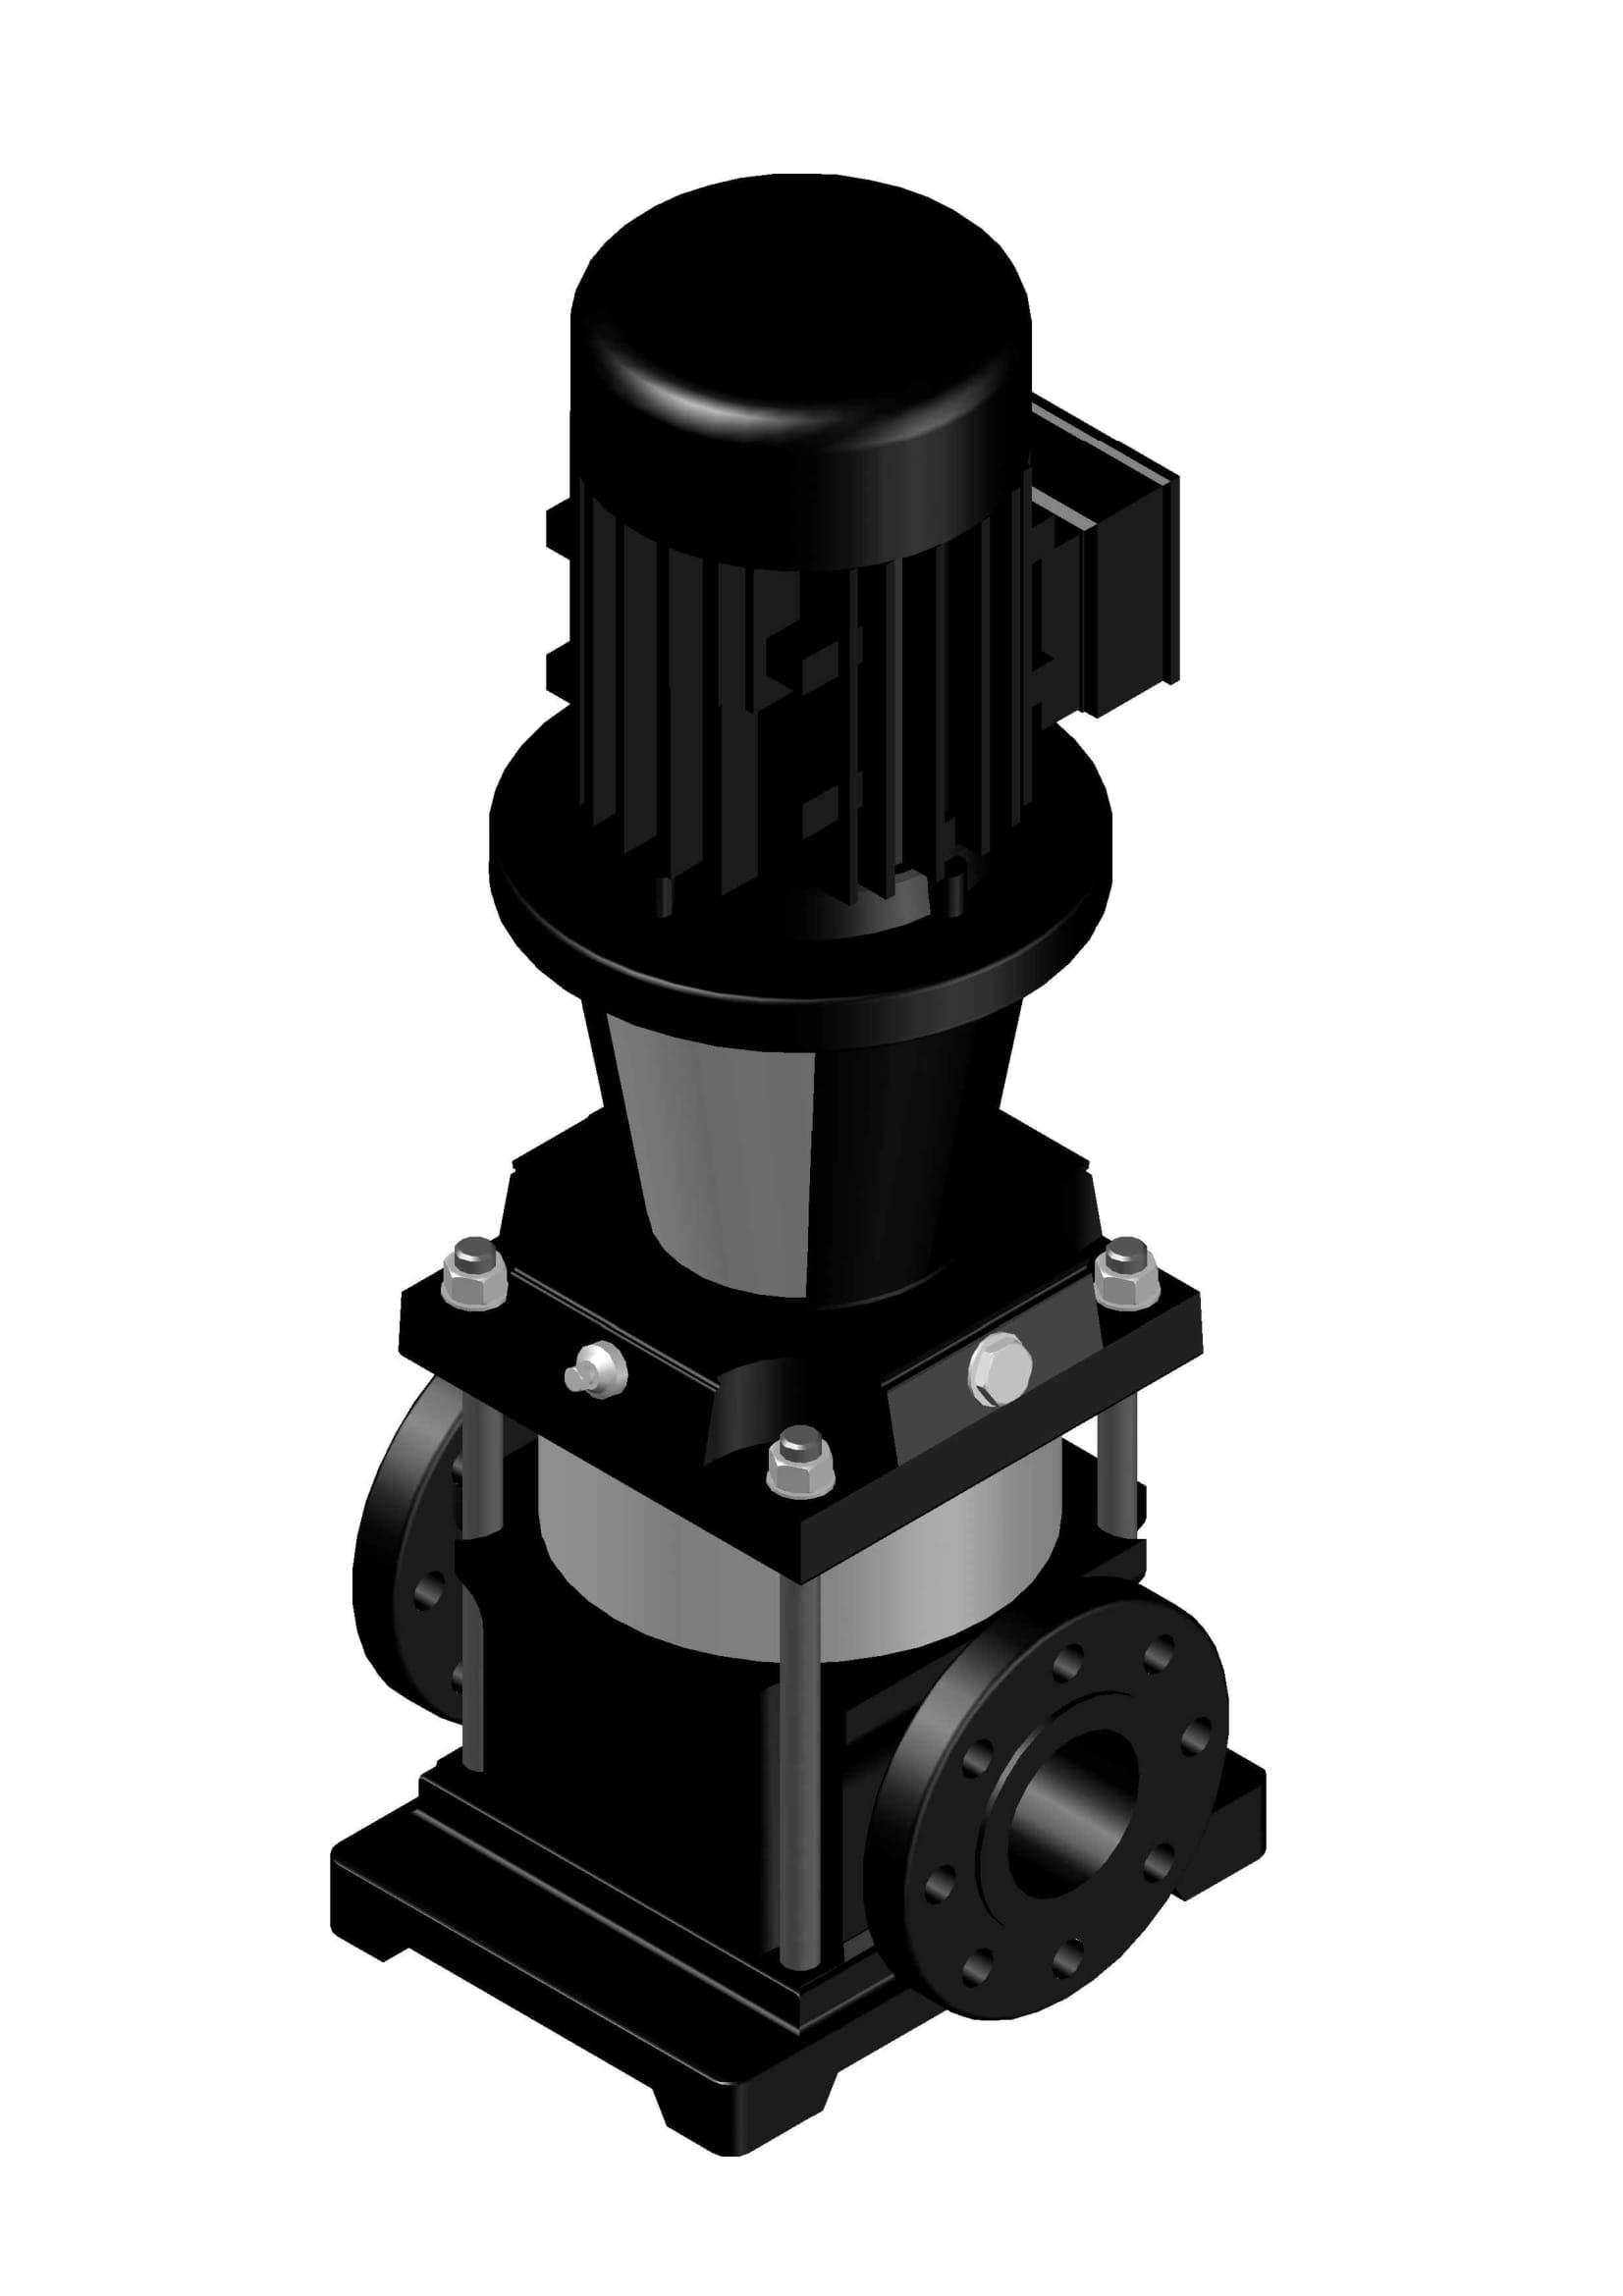 BV 45-01-01